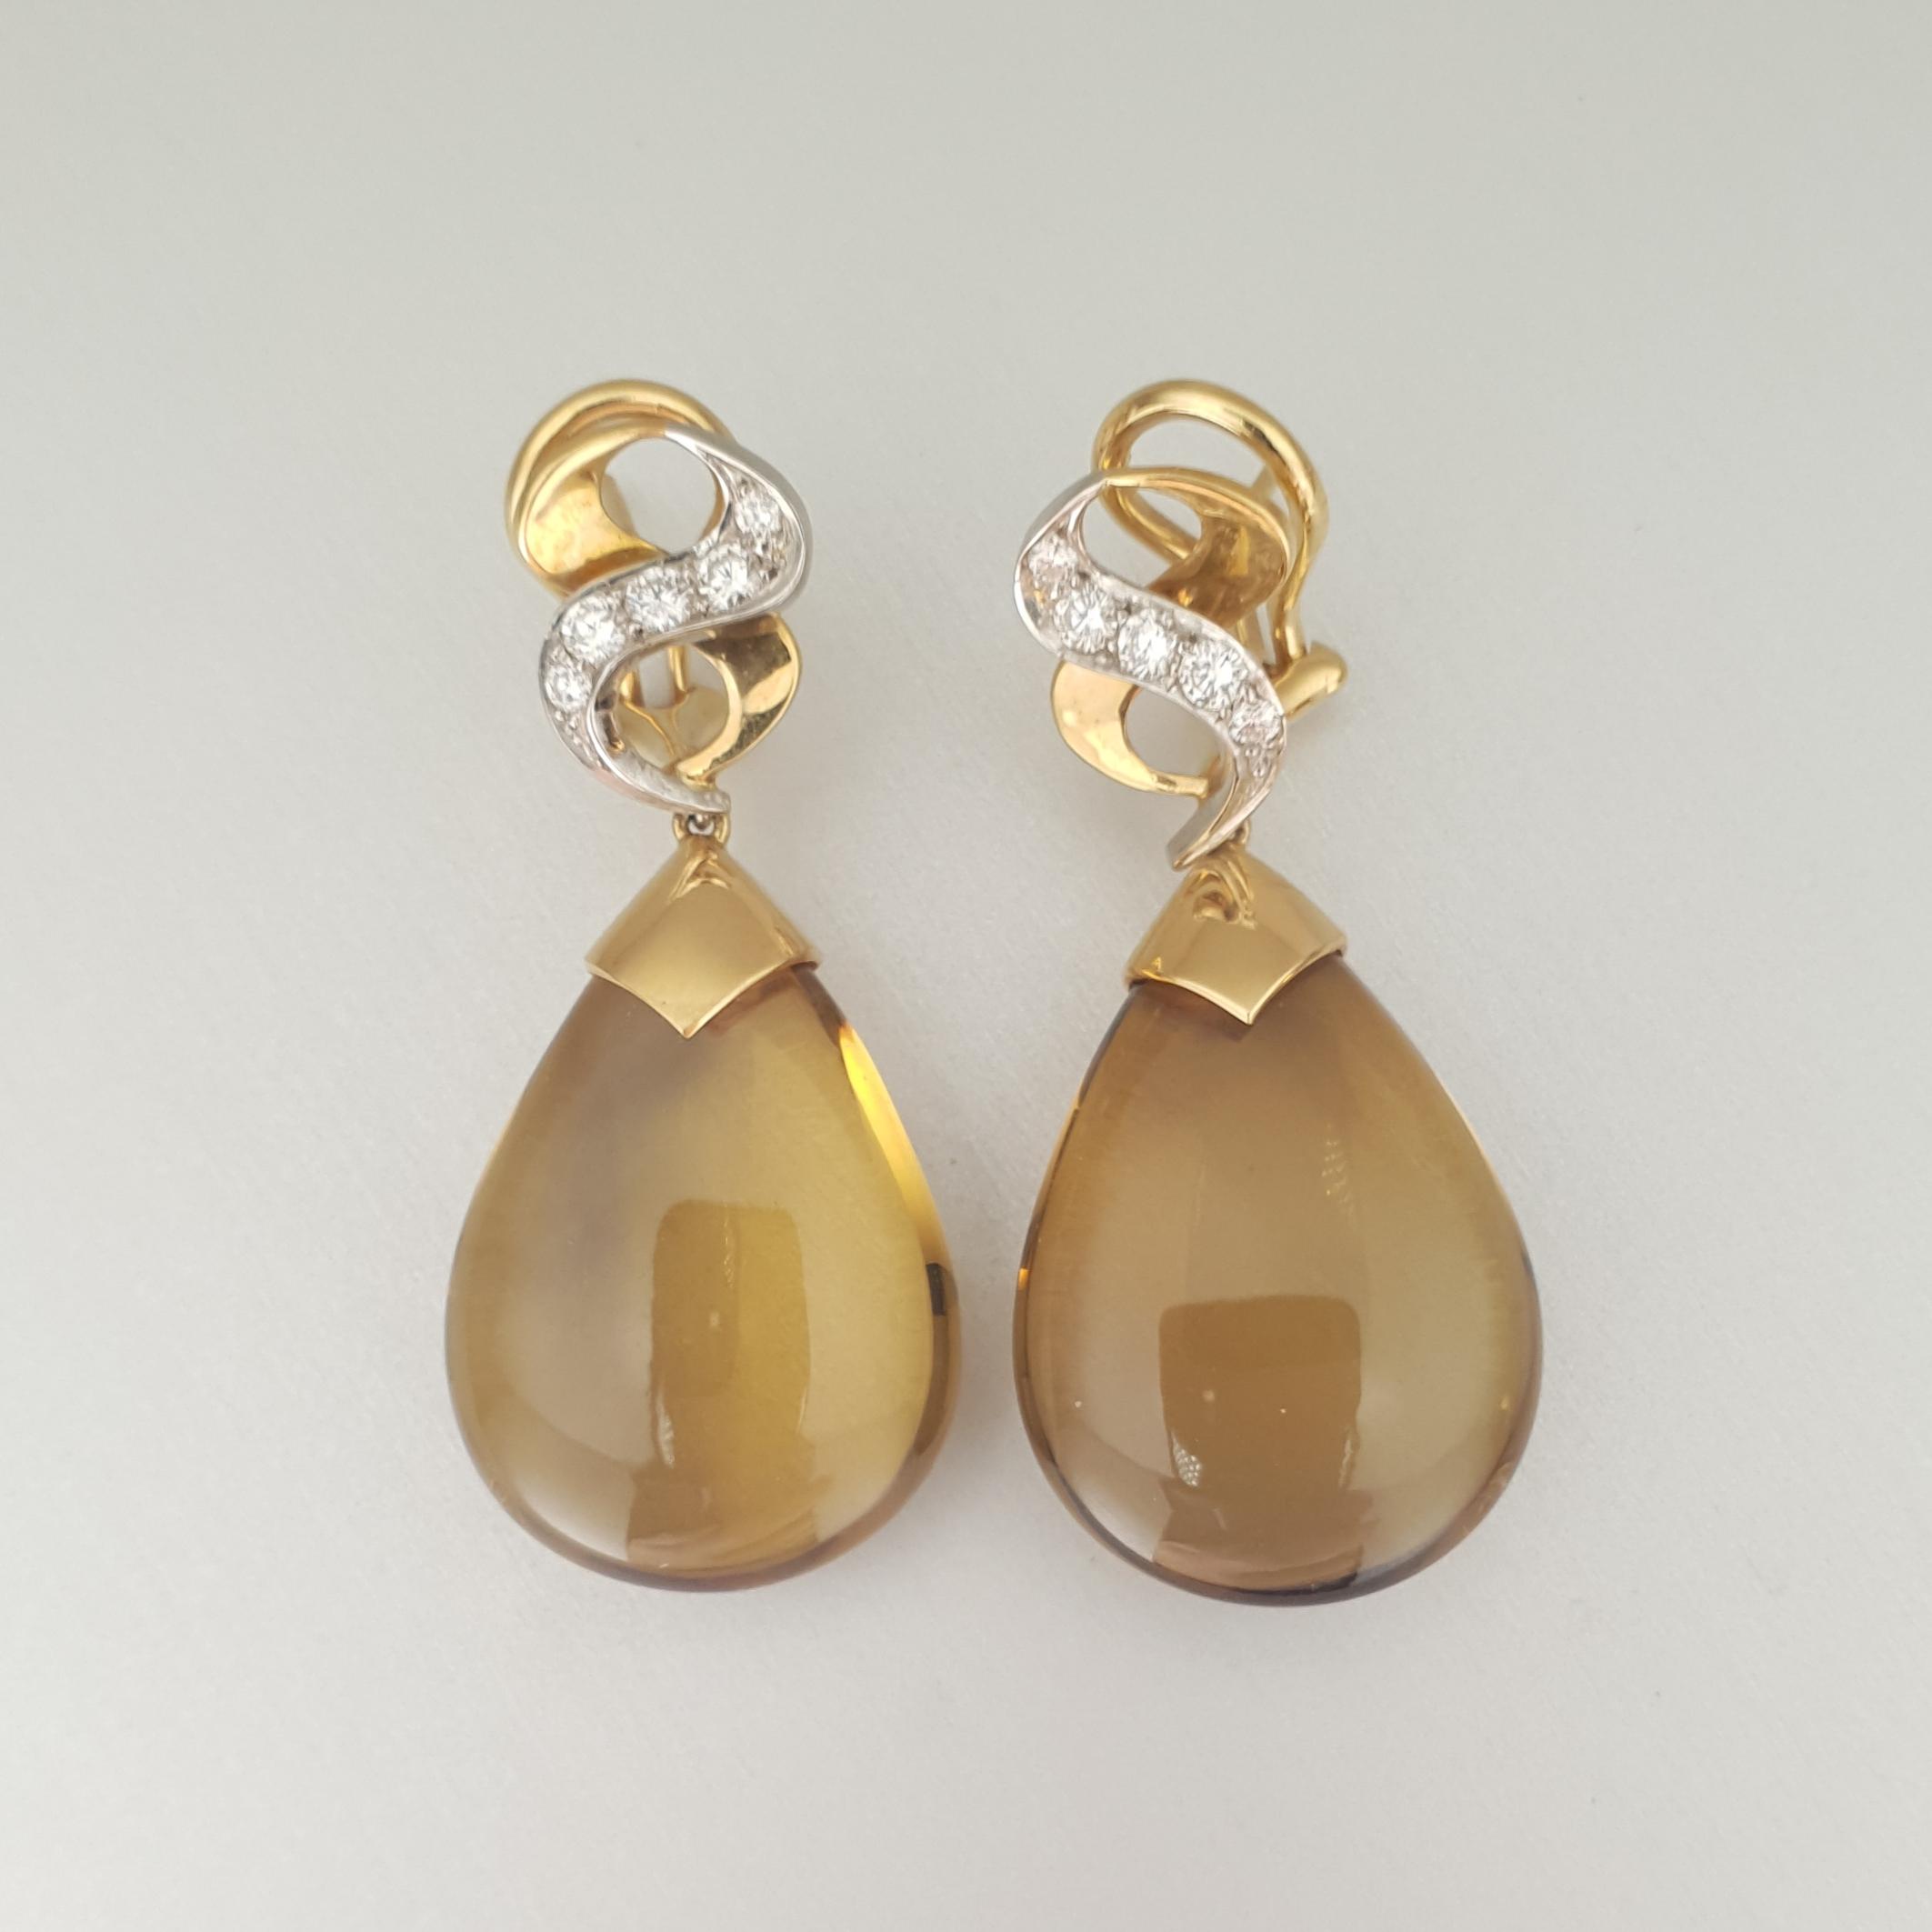 Quartz and Diamond 'Lyra' Earrings